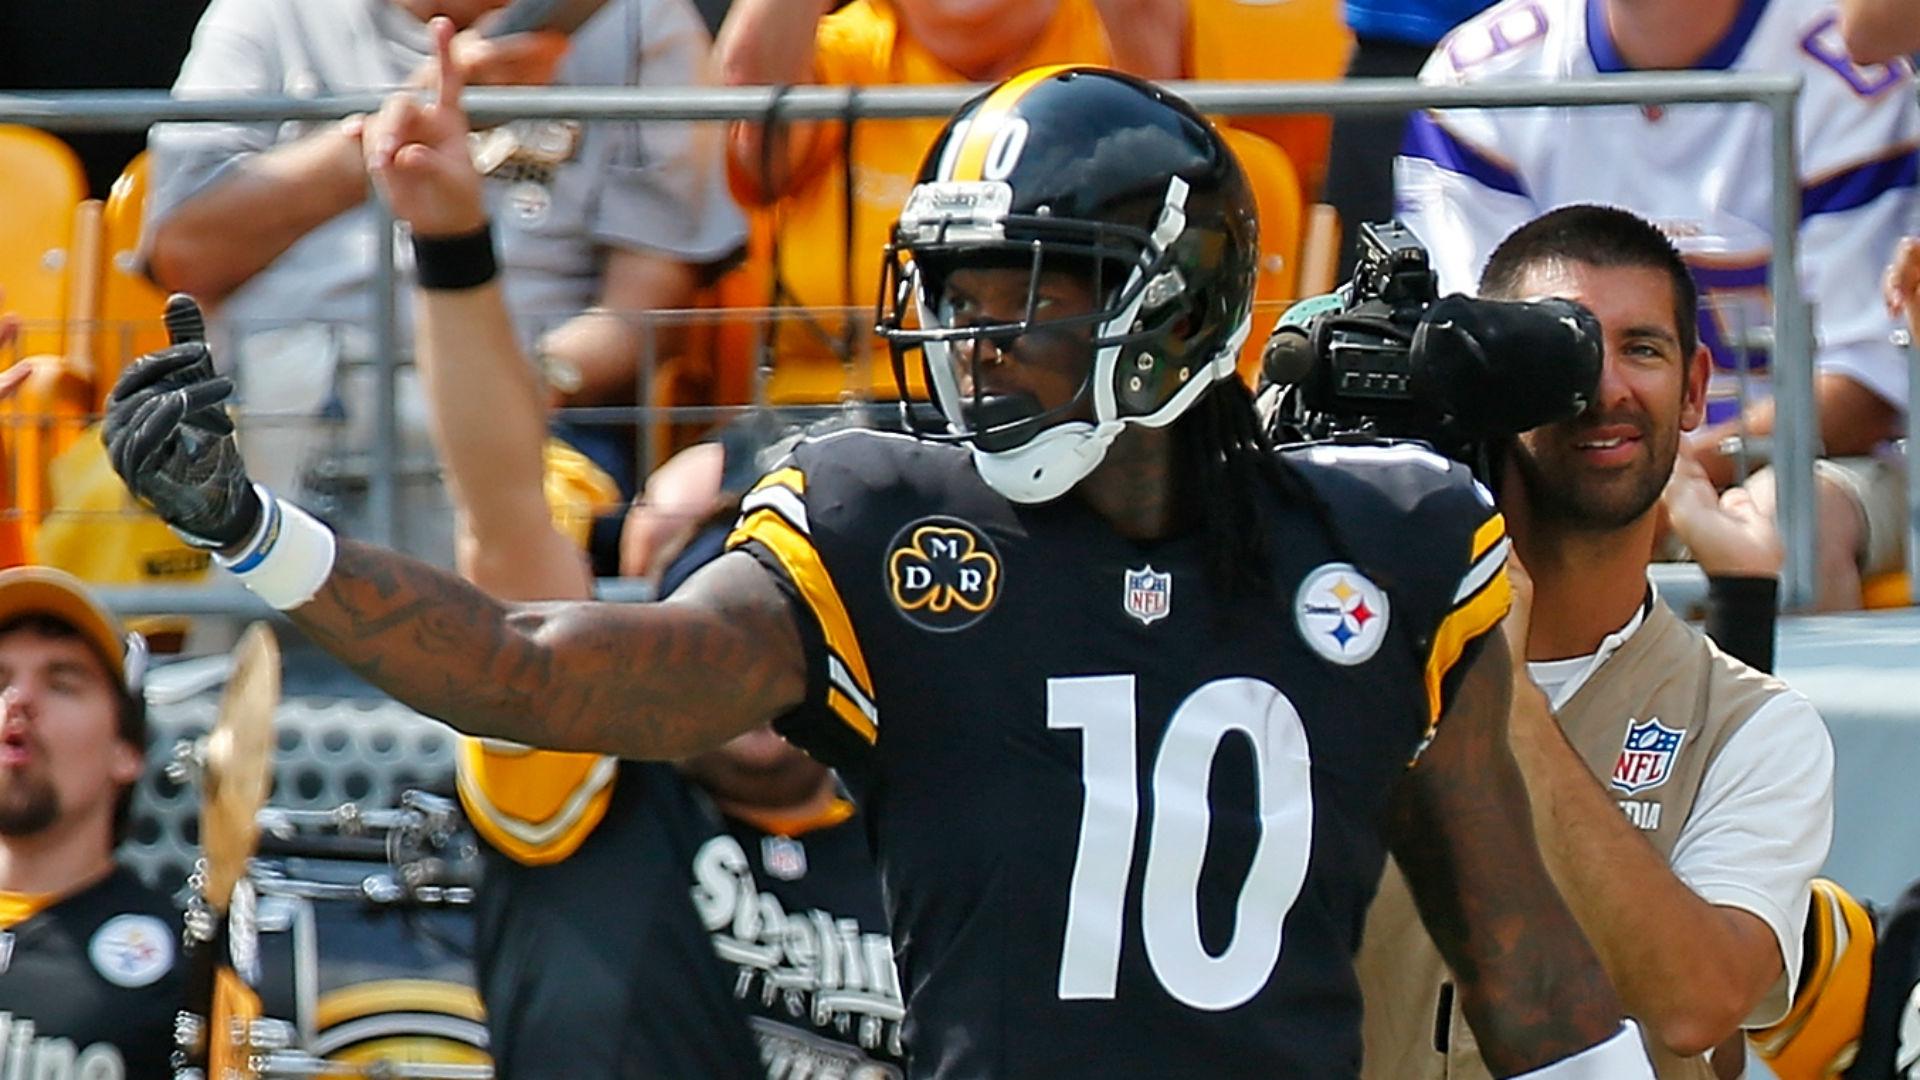 Steelers WR Martavis Bryant s trade request is more fantasy